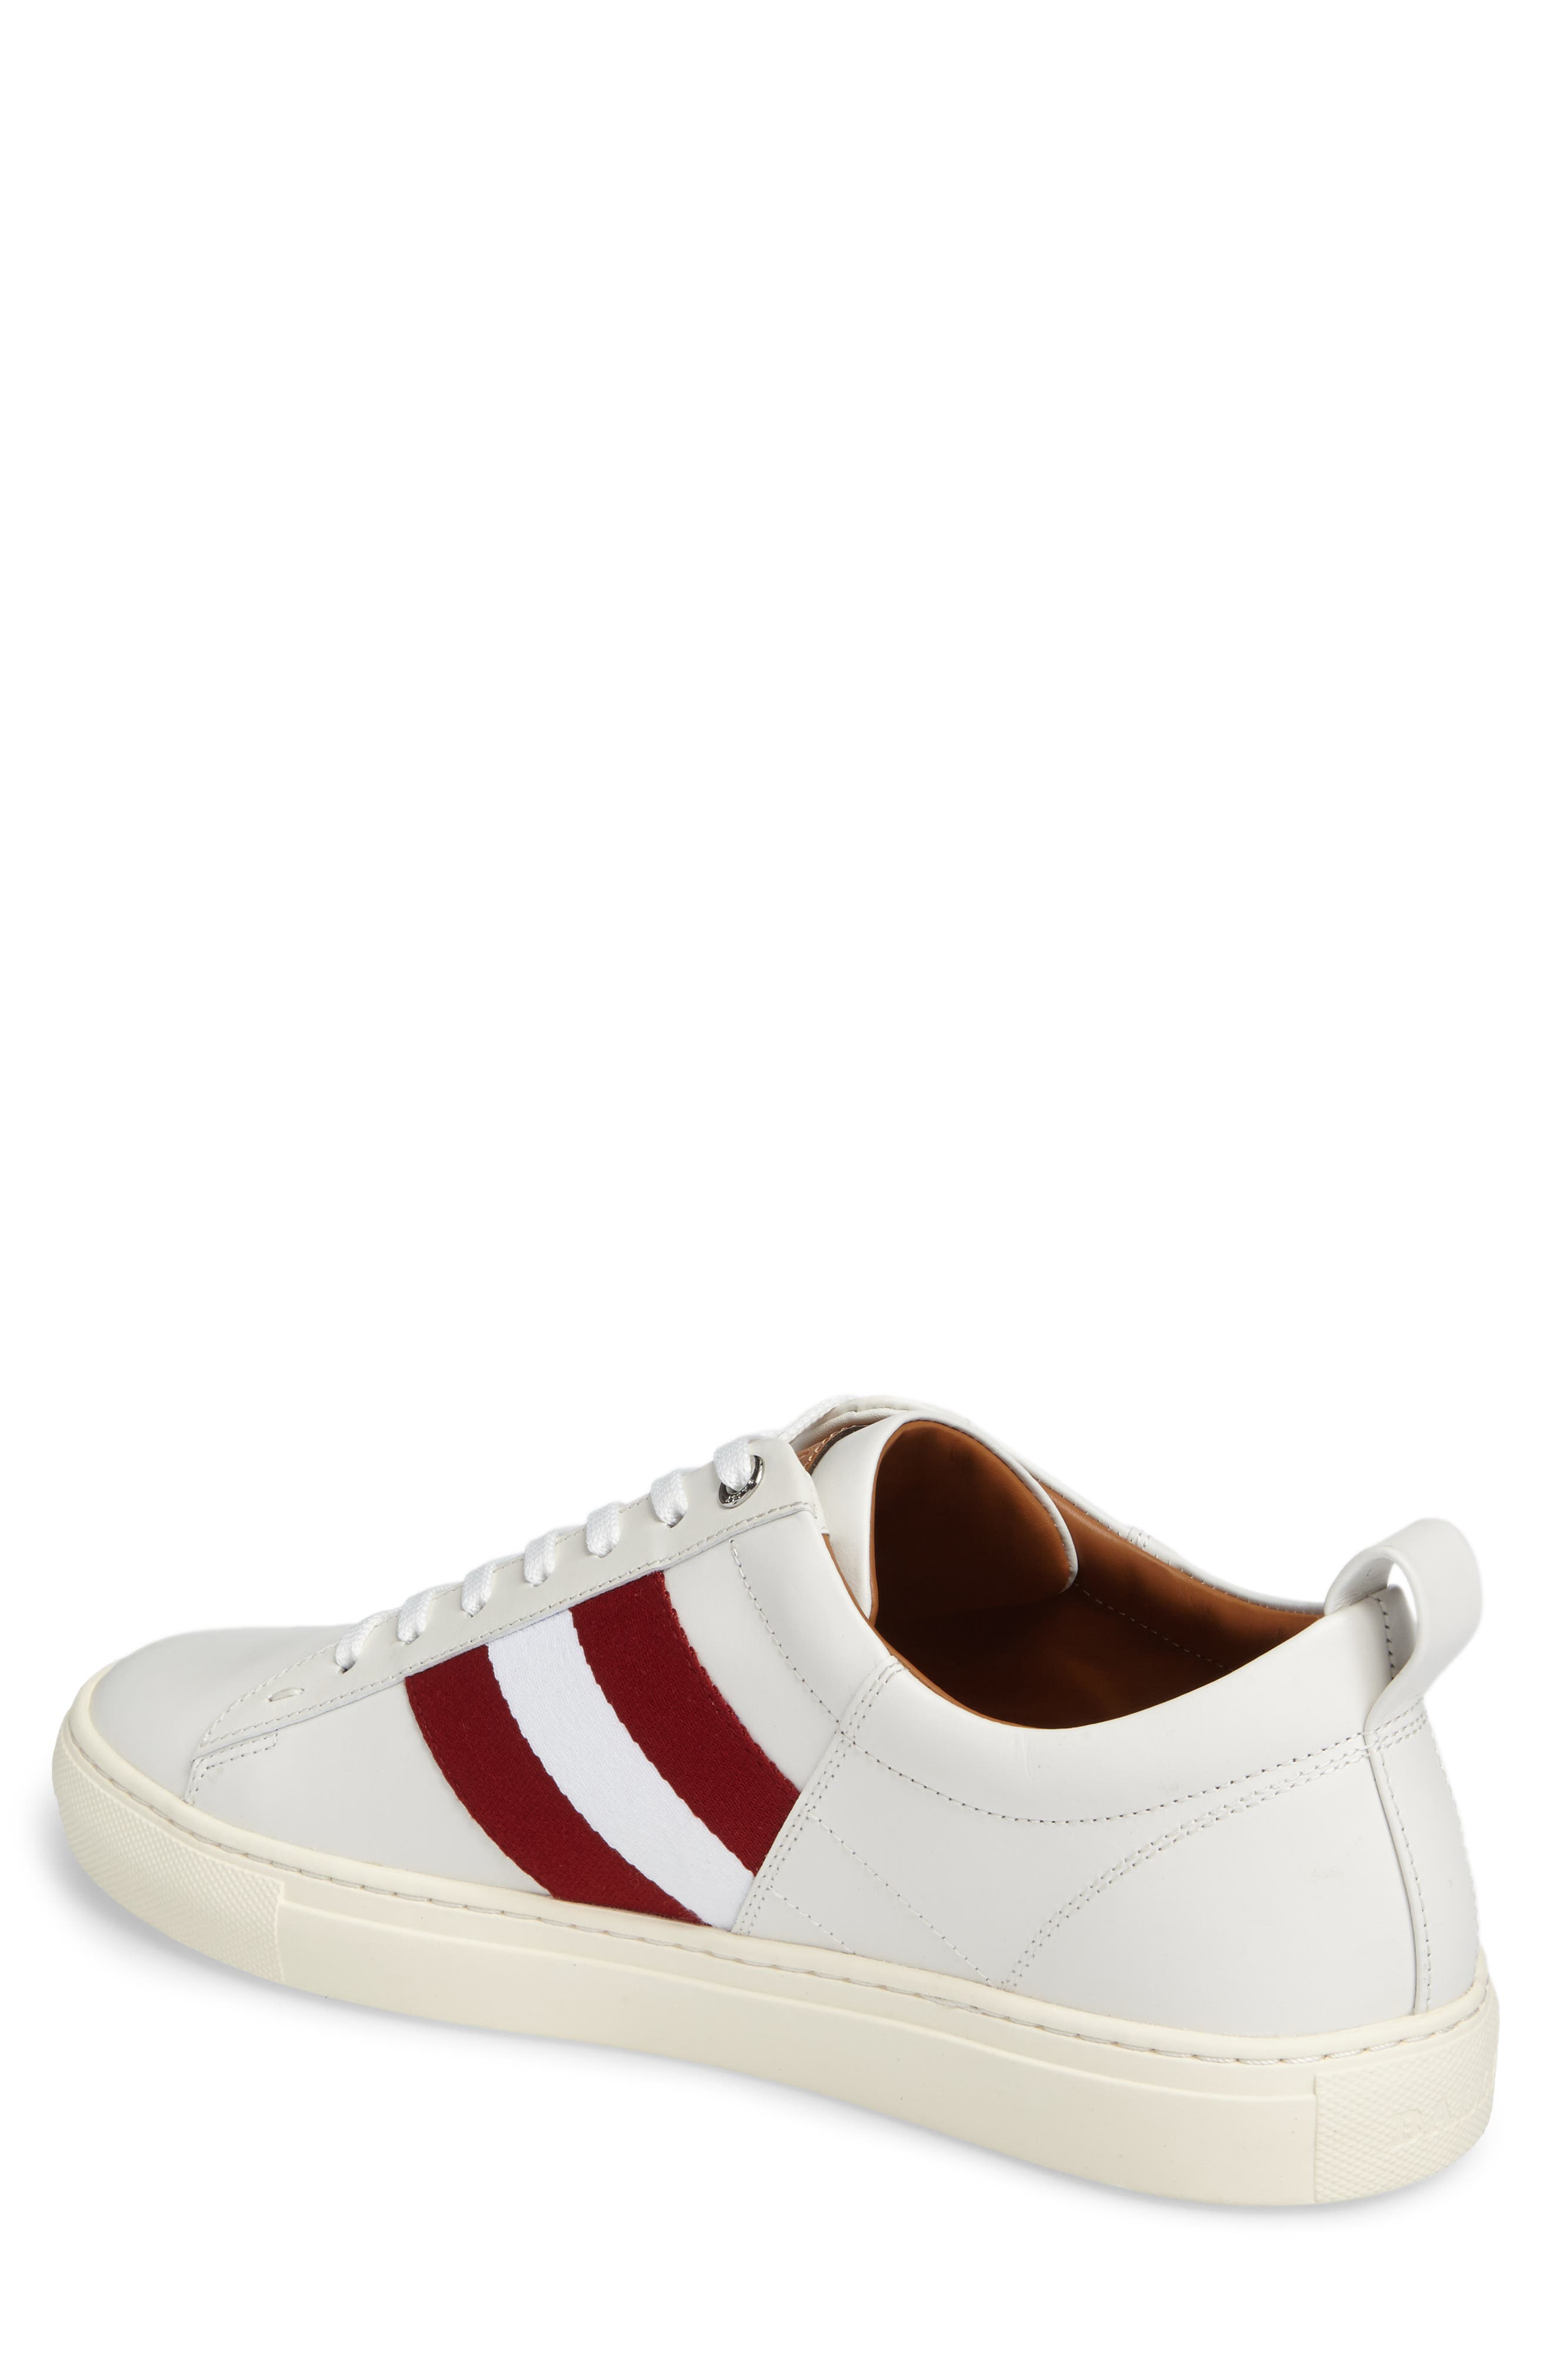 'Helvio' Sneaker,                             Alternate thumbnail 2, color,                             WHITE